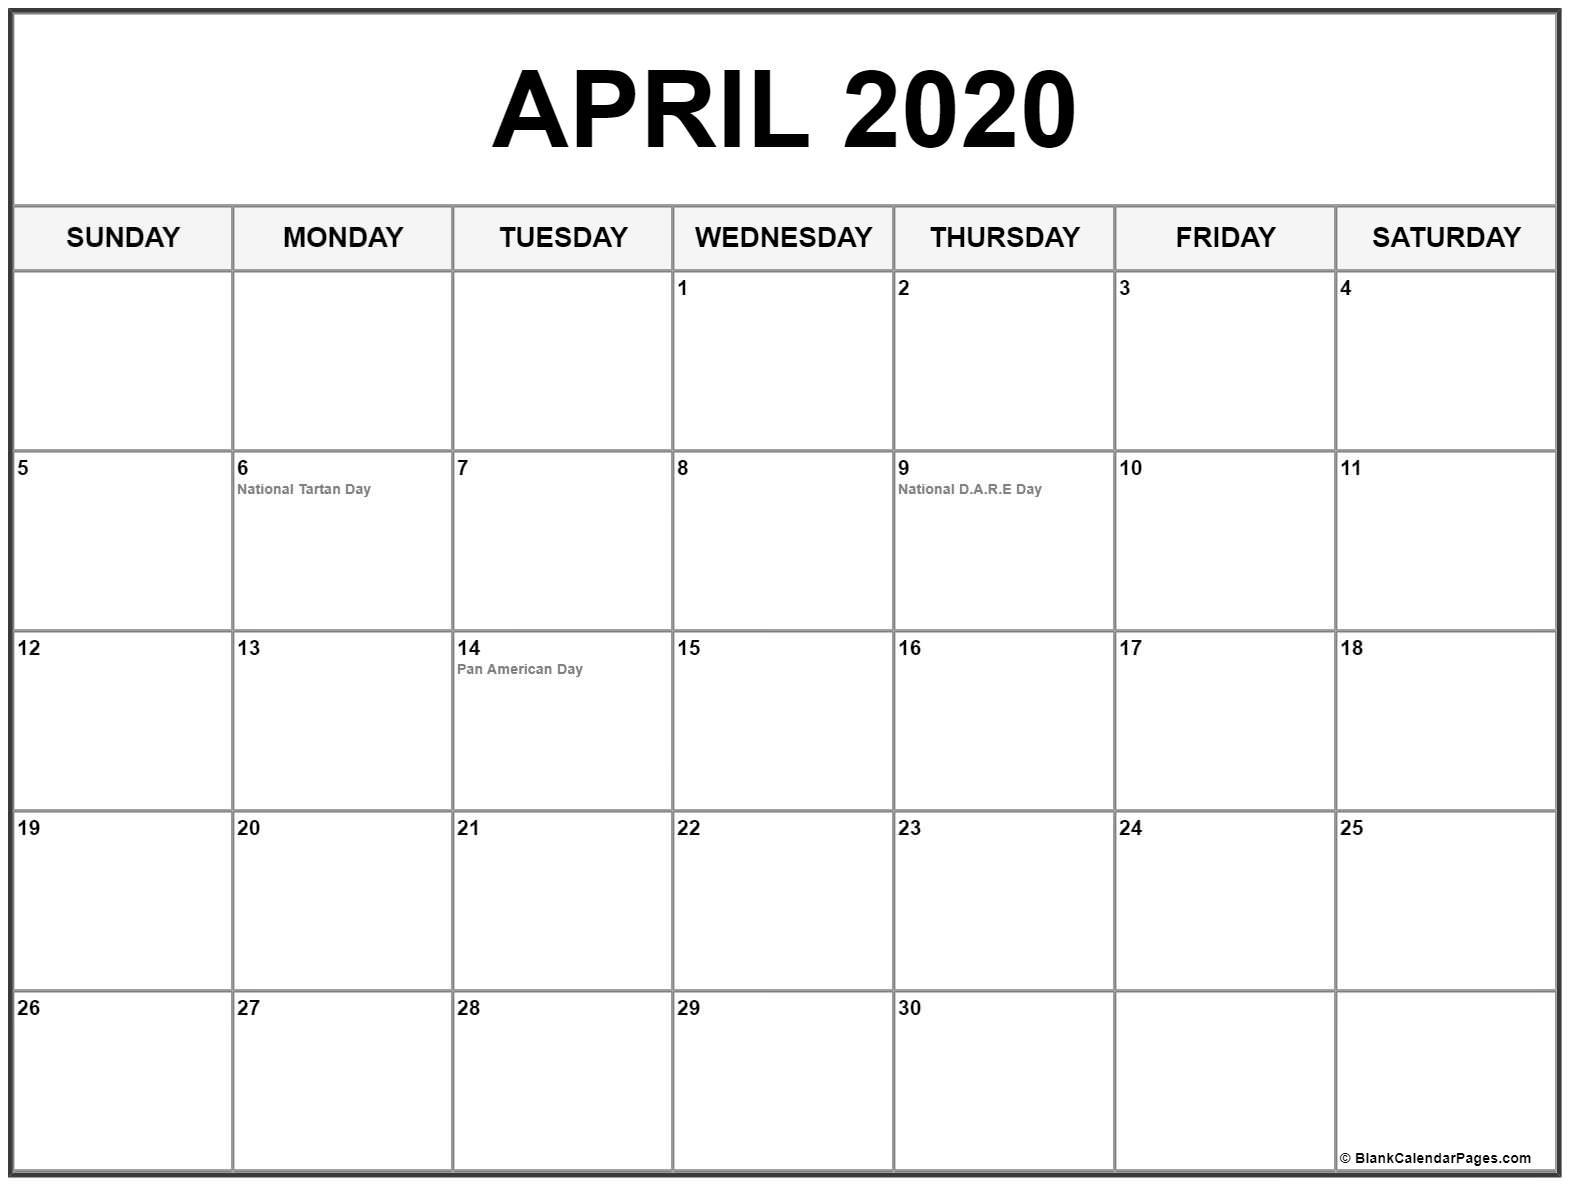 Collection Of April 2020 Calendars With Holidays Perky Printable Calendar 2020 Of Ridiculous Holidays